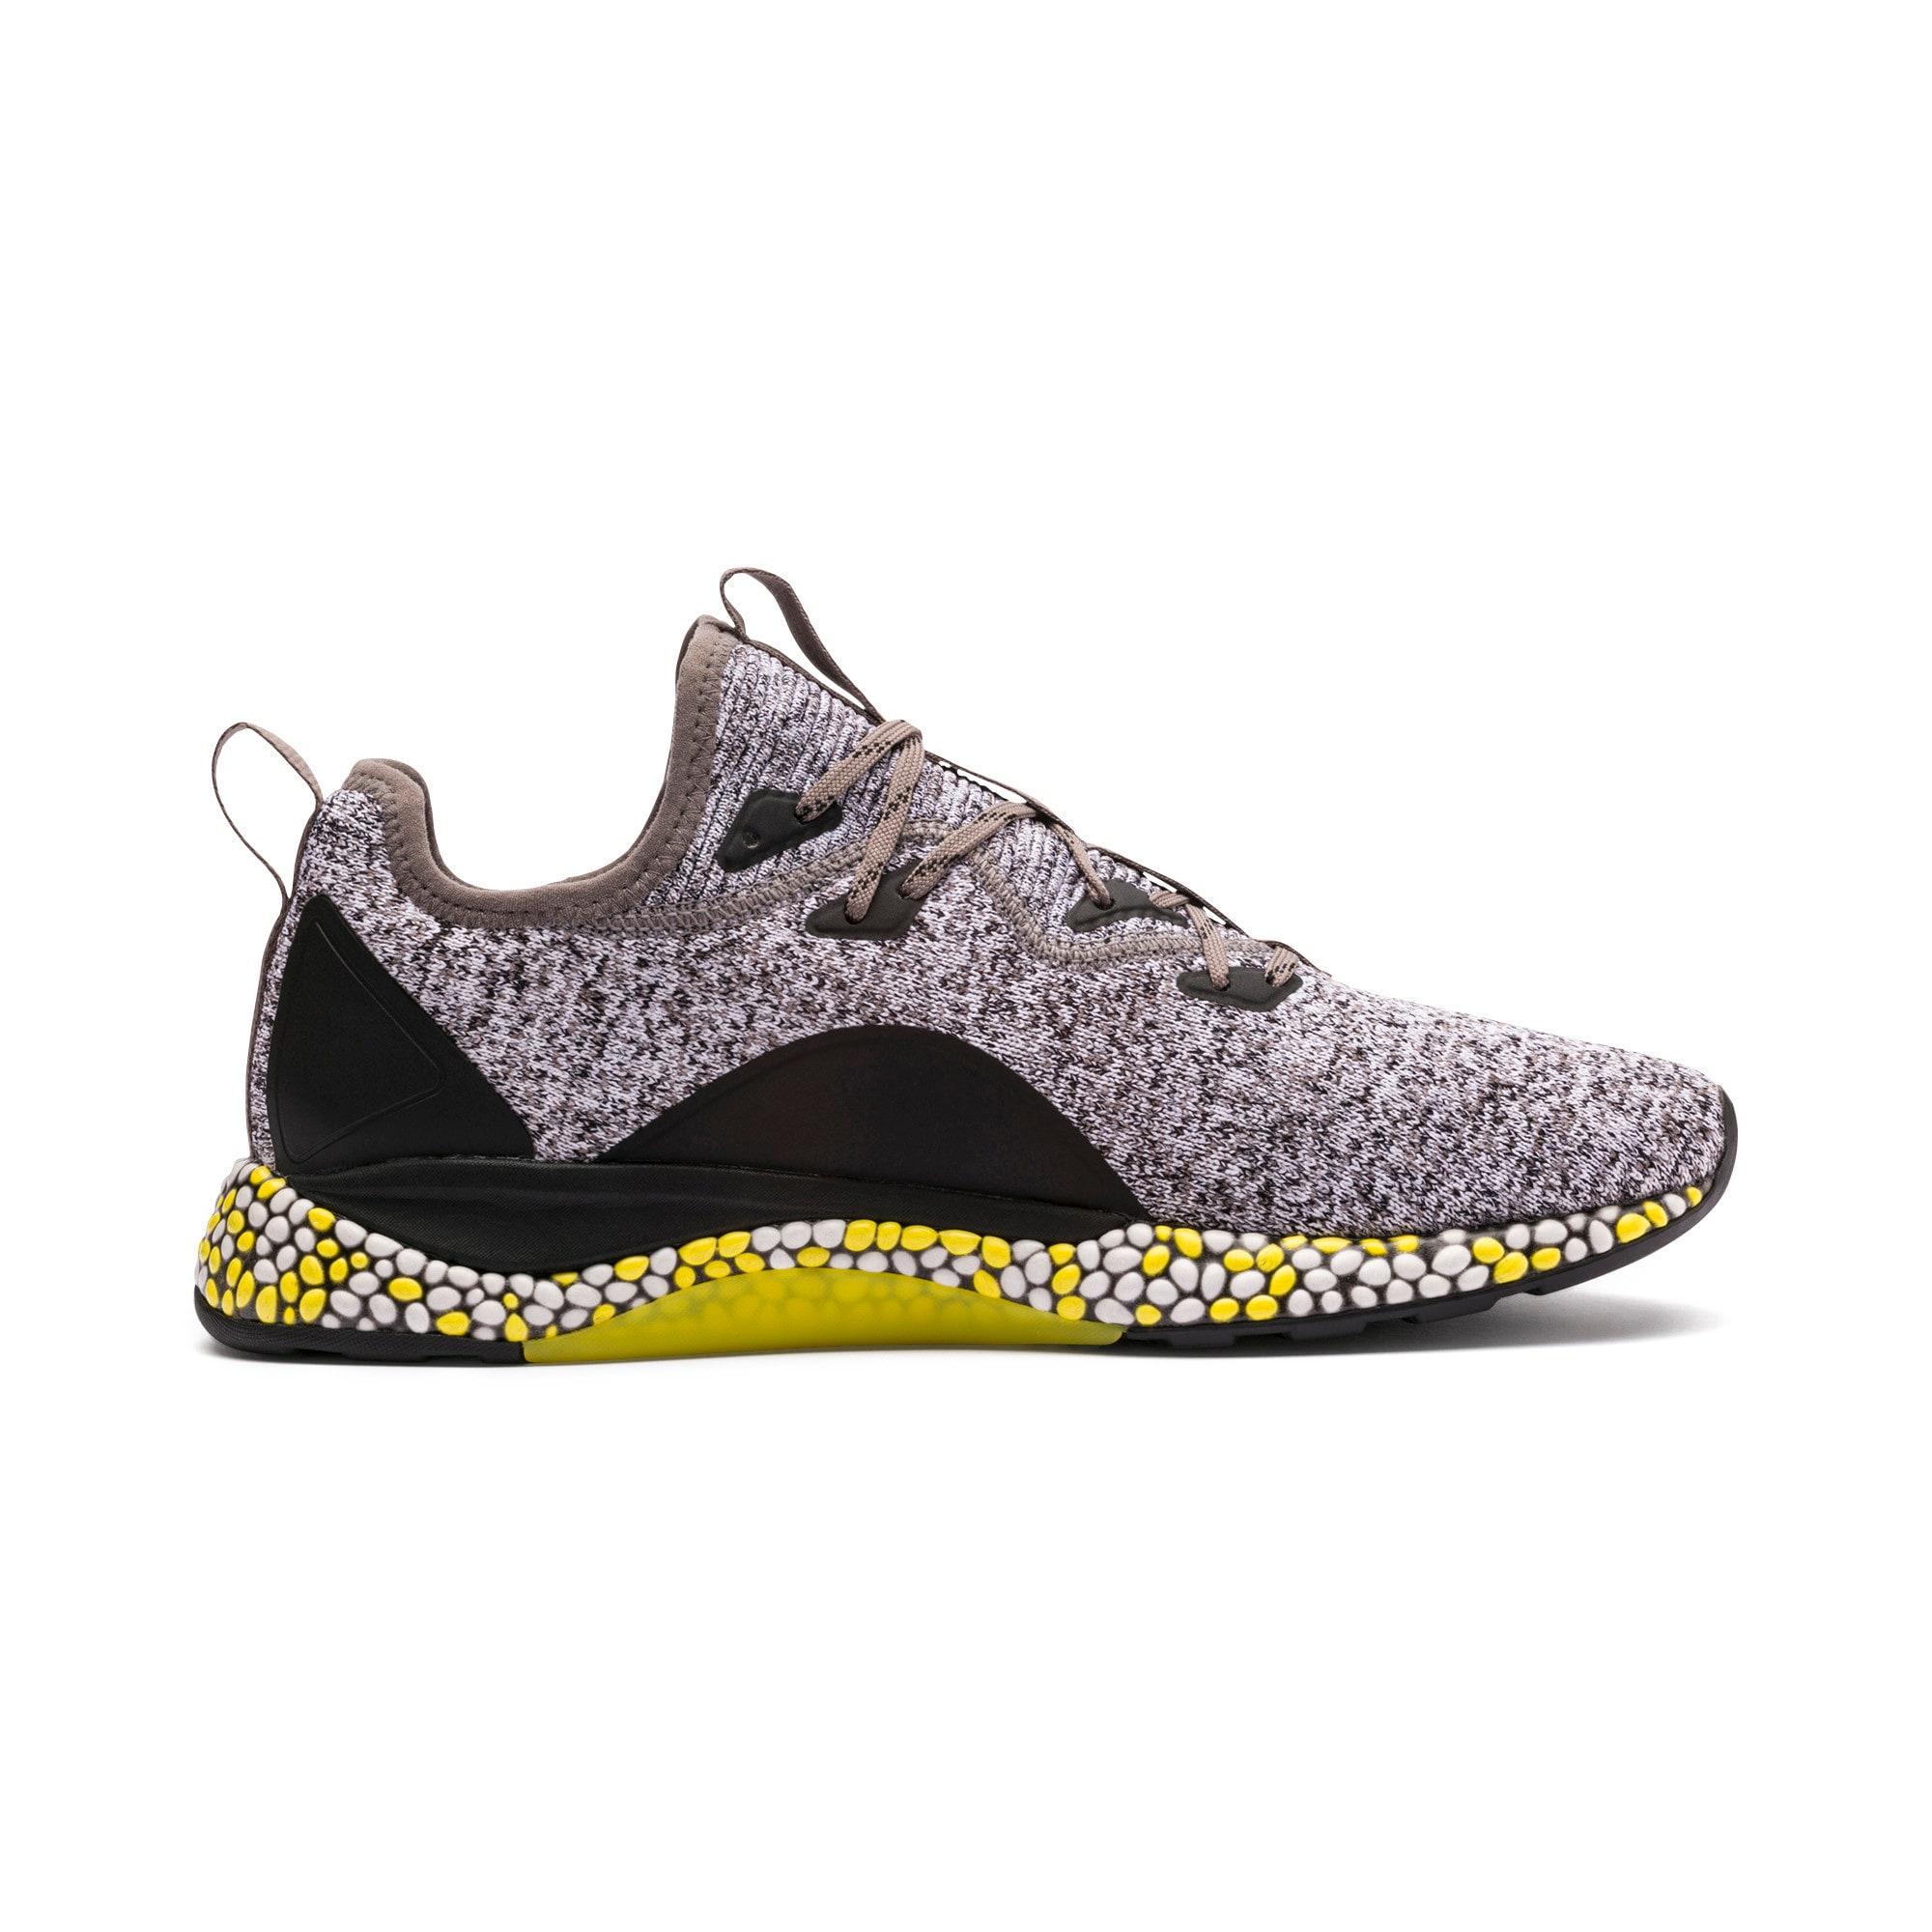 Thumbnail 5 of Hybrid Runner Men's Running Shoes, Black-White-Blazing Yellow, medium